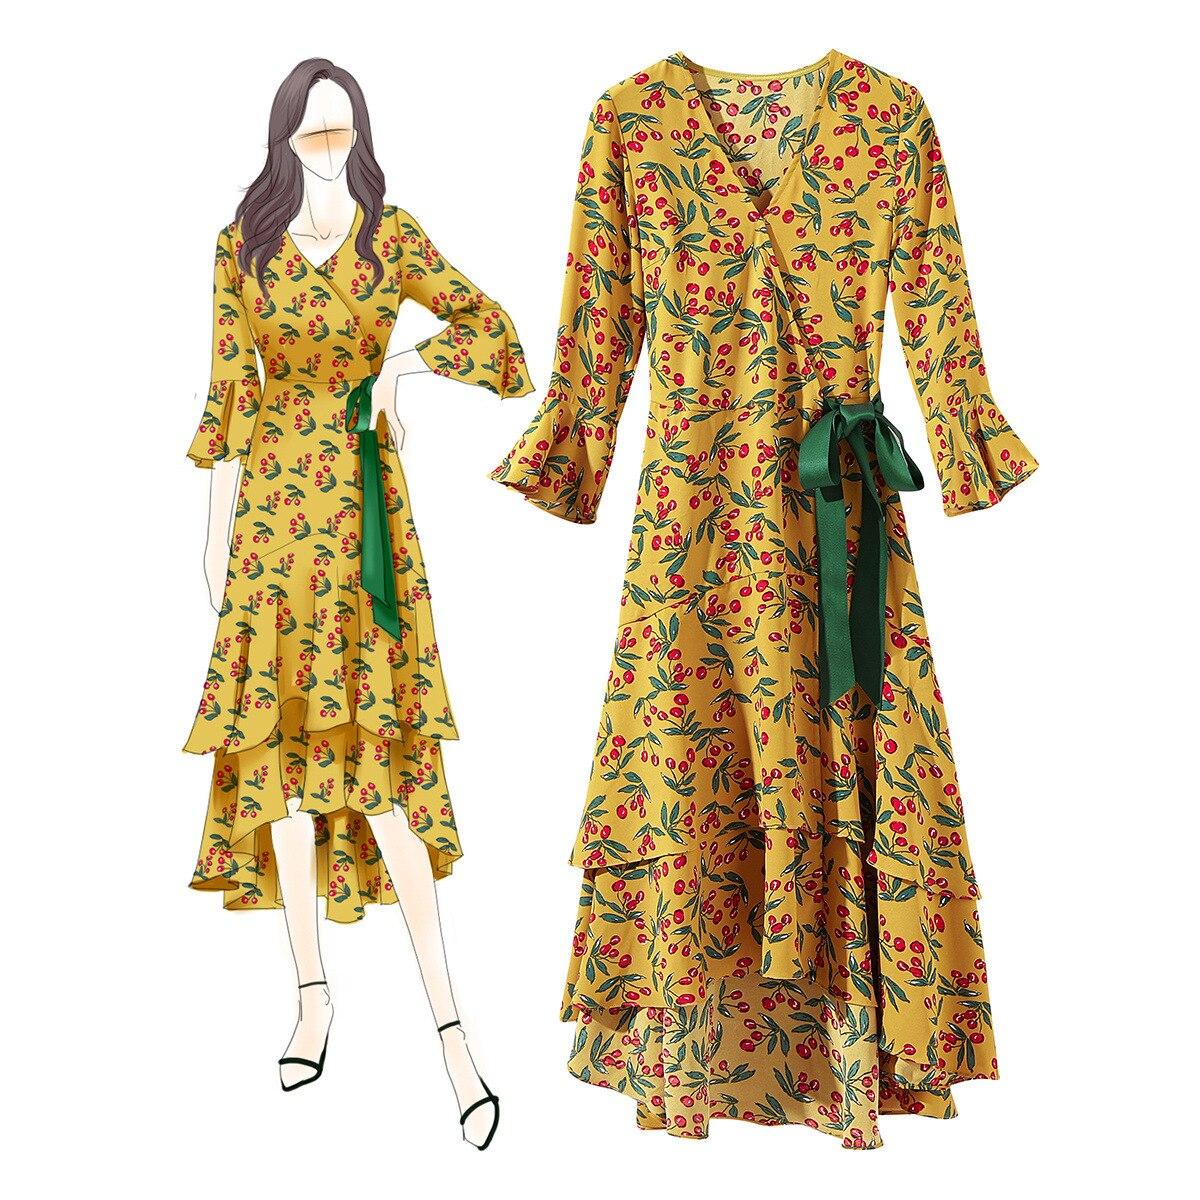 Unique Design Boutique Dress for Women Summer New V neck Slant Belt Irregular Lotus Yellow Leaf Side Dress in Dresses from Women 39 s Clothing